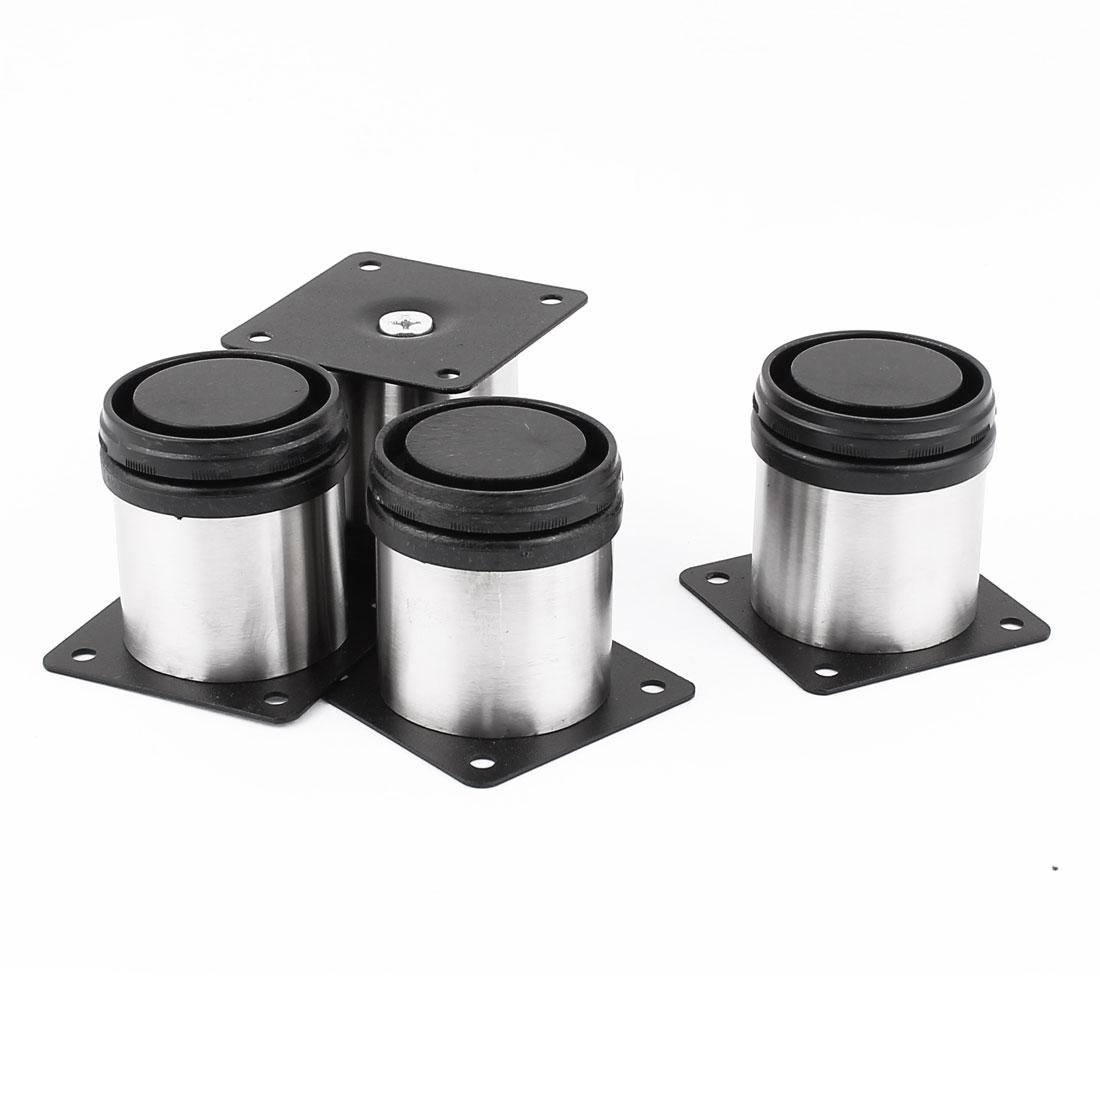 Kitchen Furniture 60mm Adjustable Cabinet Legs Feet Plinth 4pcs